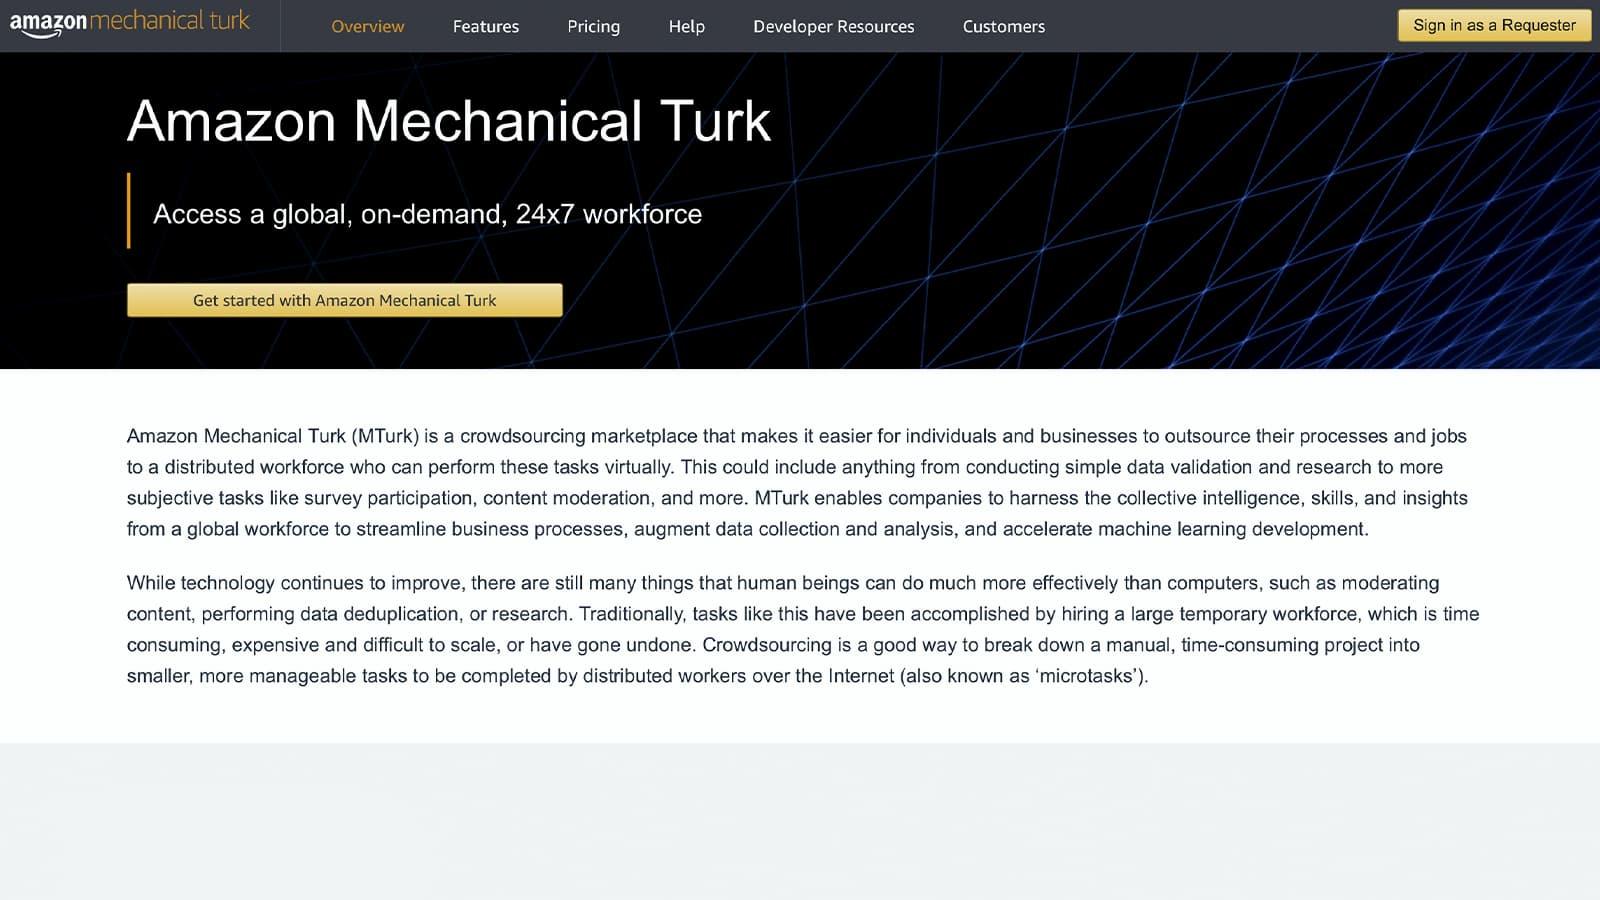 Página inicial do Amazon Mechanical Turk